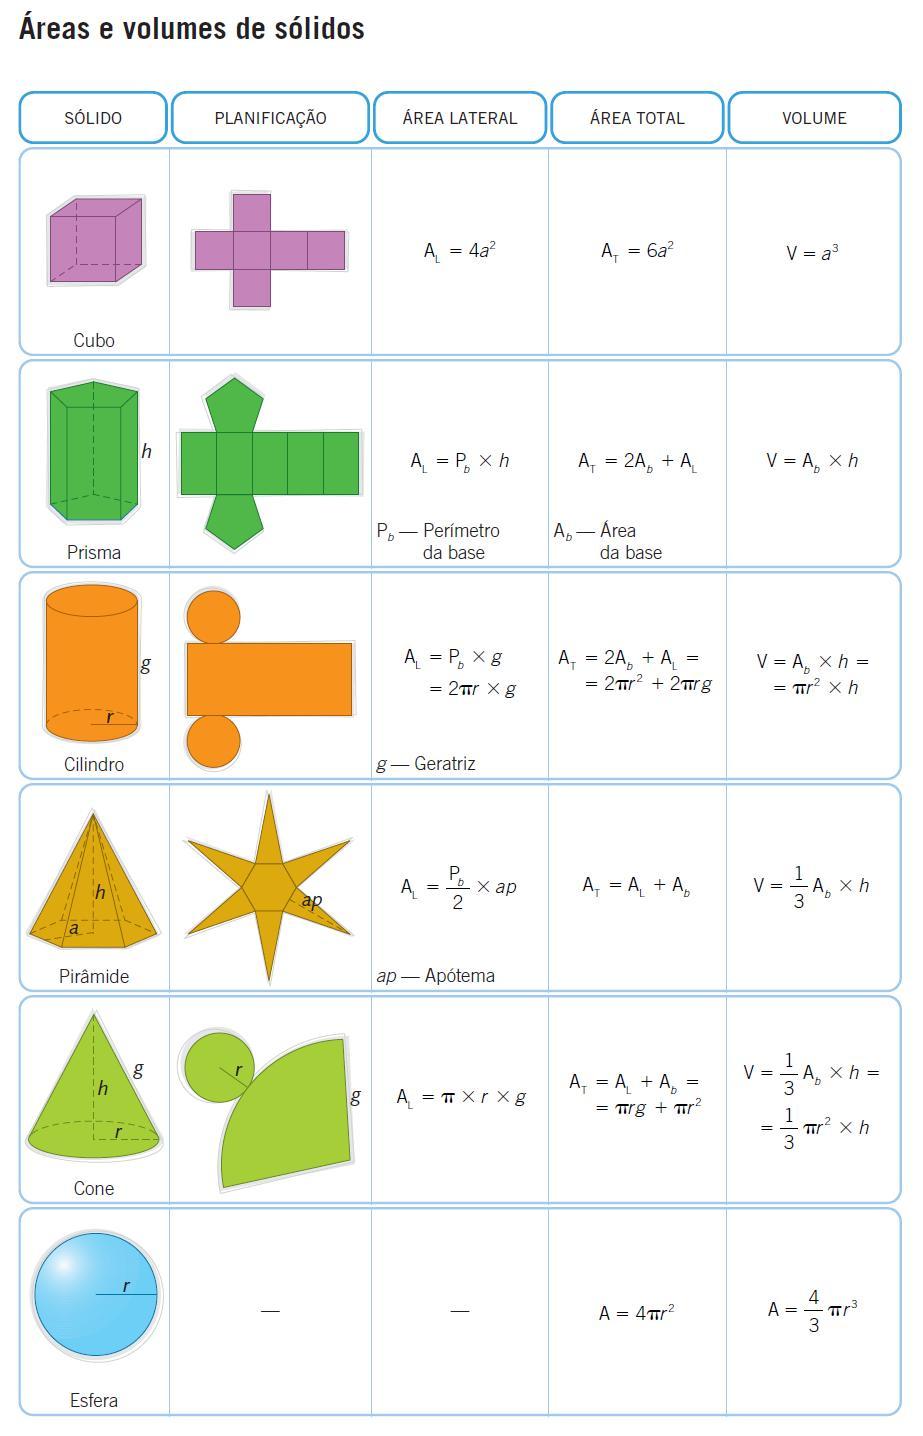 Formulario di Matematica des photos, des photos de fond, fond d'écran